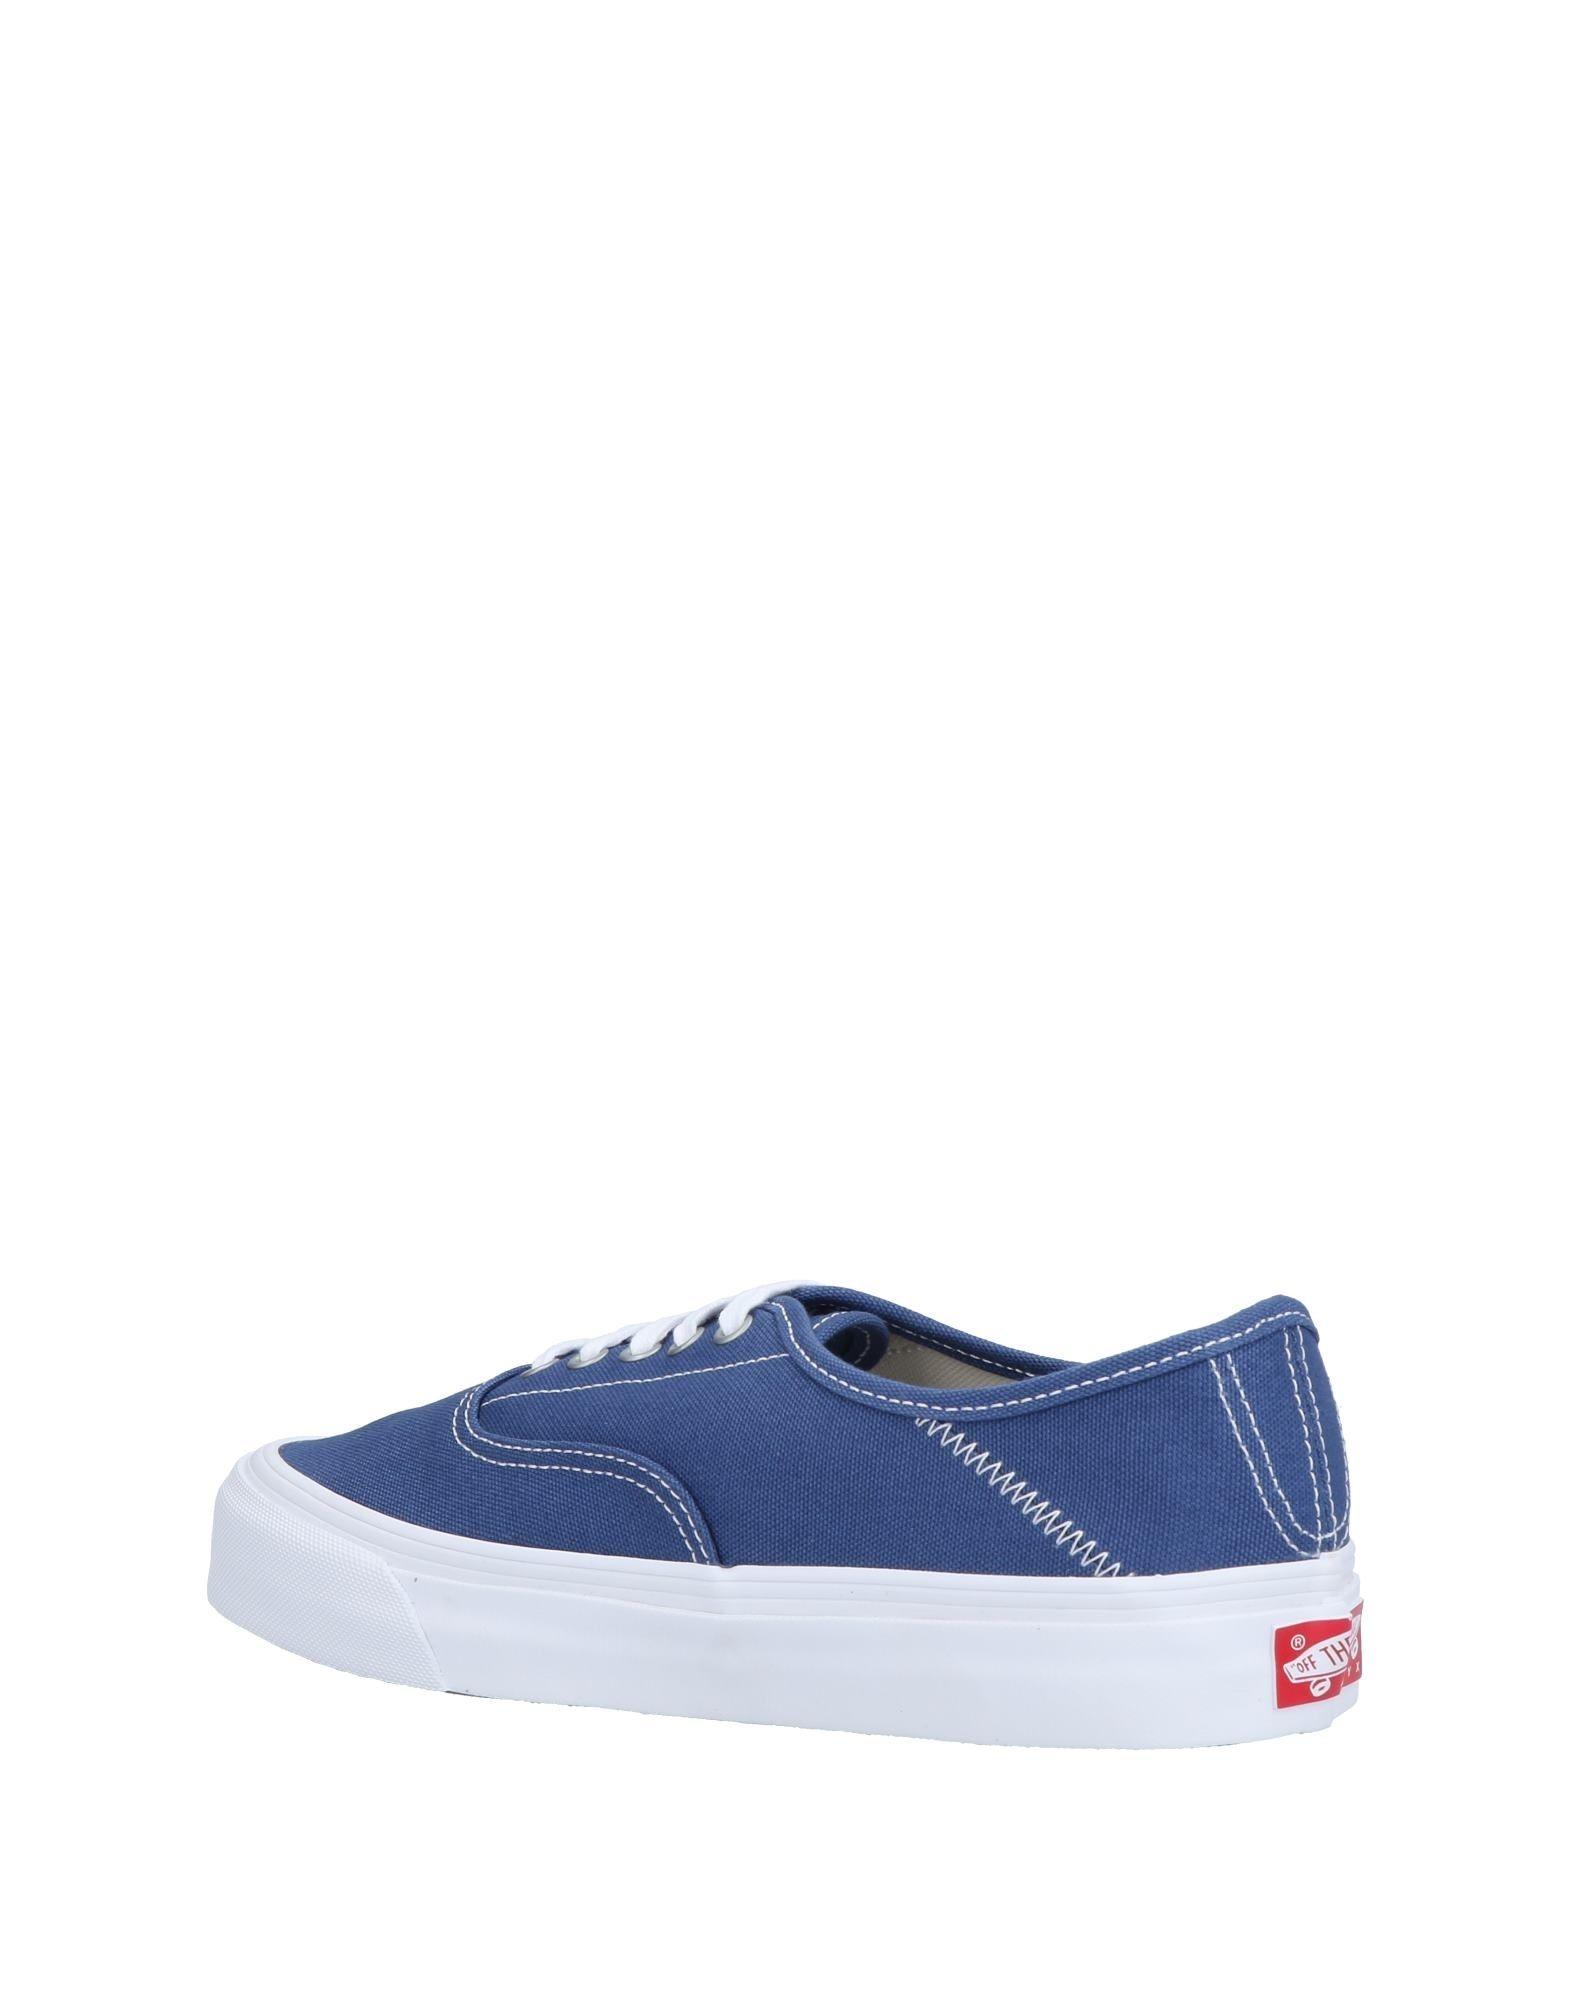 Damen Vans Sneakers Damen   11496258AM Heiße Schuhe efb8ad